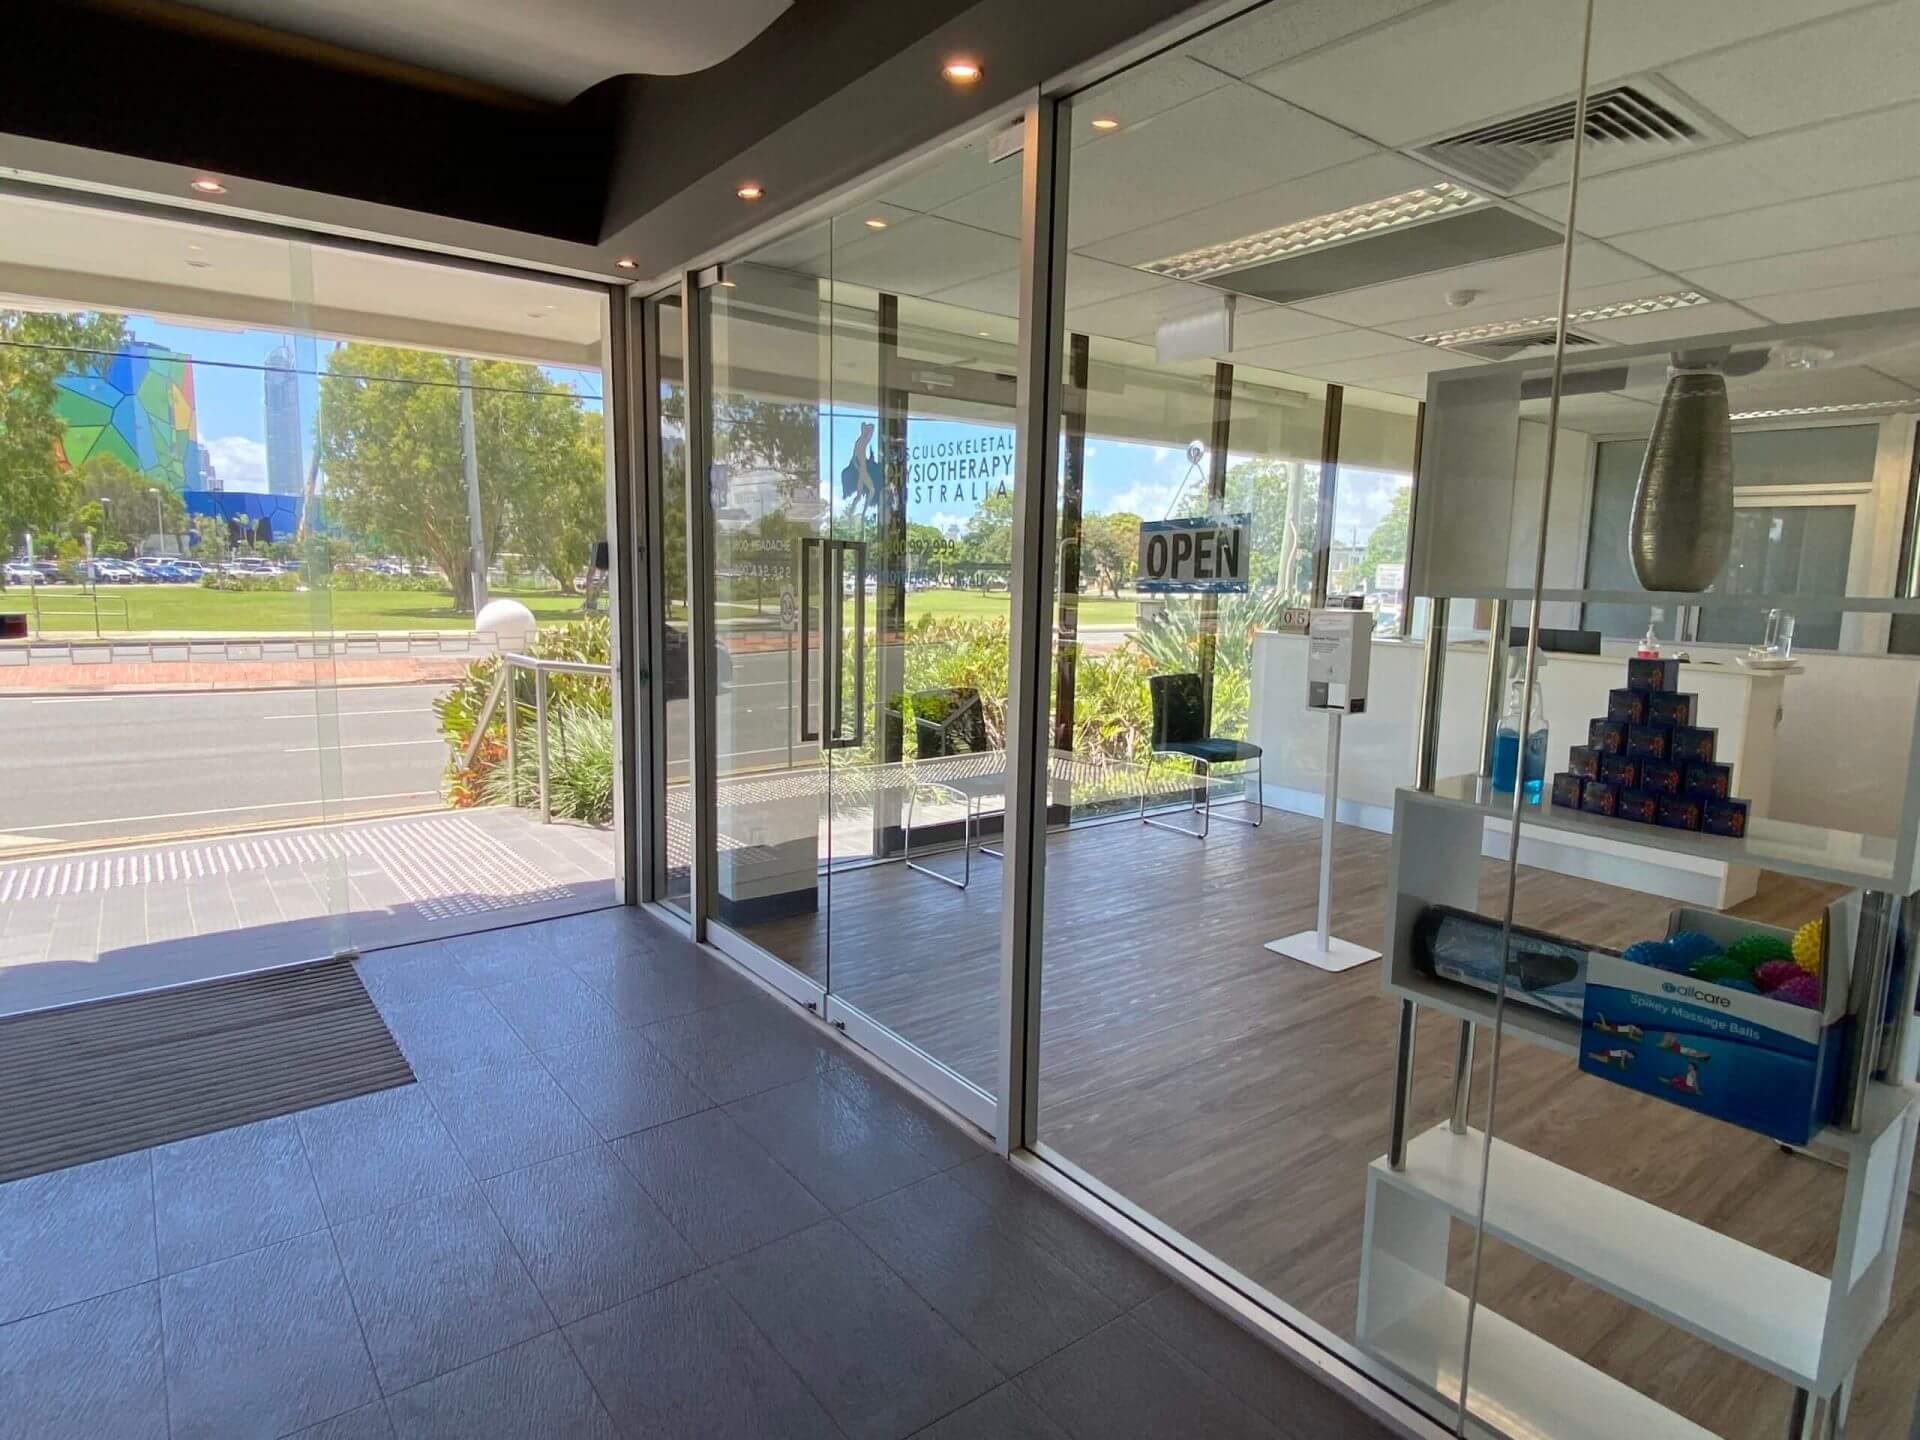 The Gold Coast Headache and Migraine Clinic - opposite HOTA - in Bundall